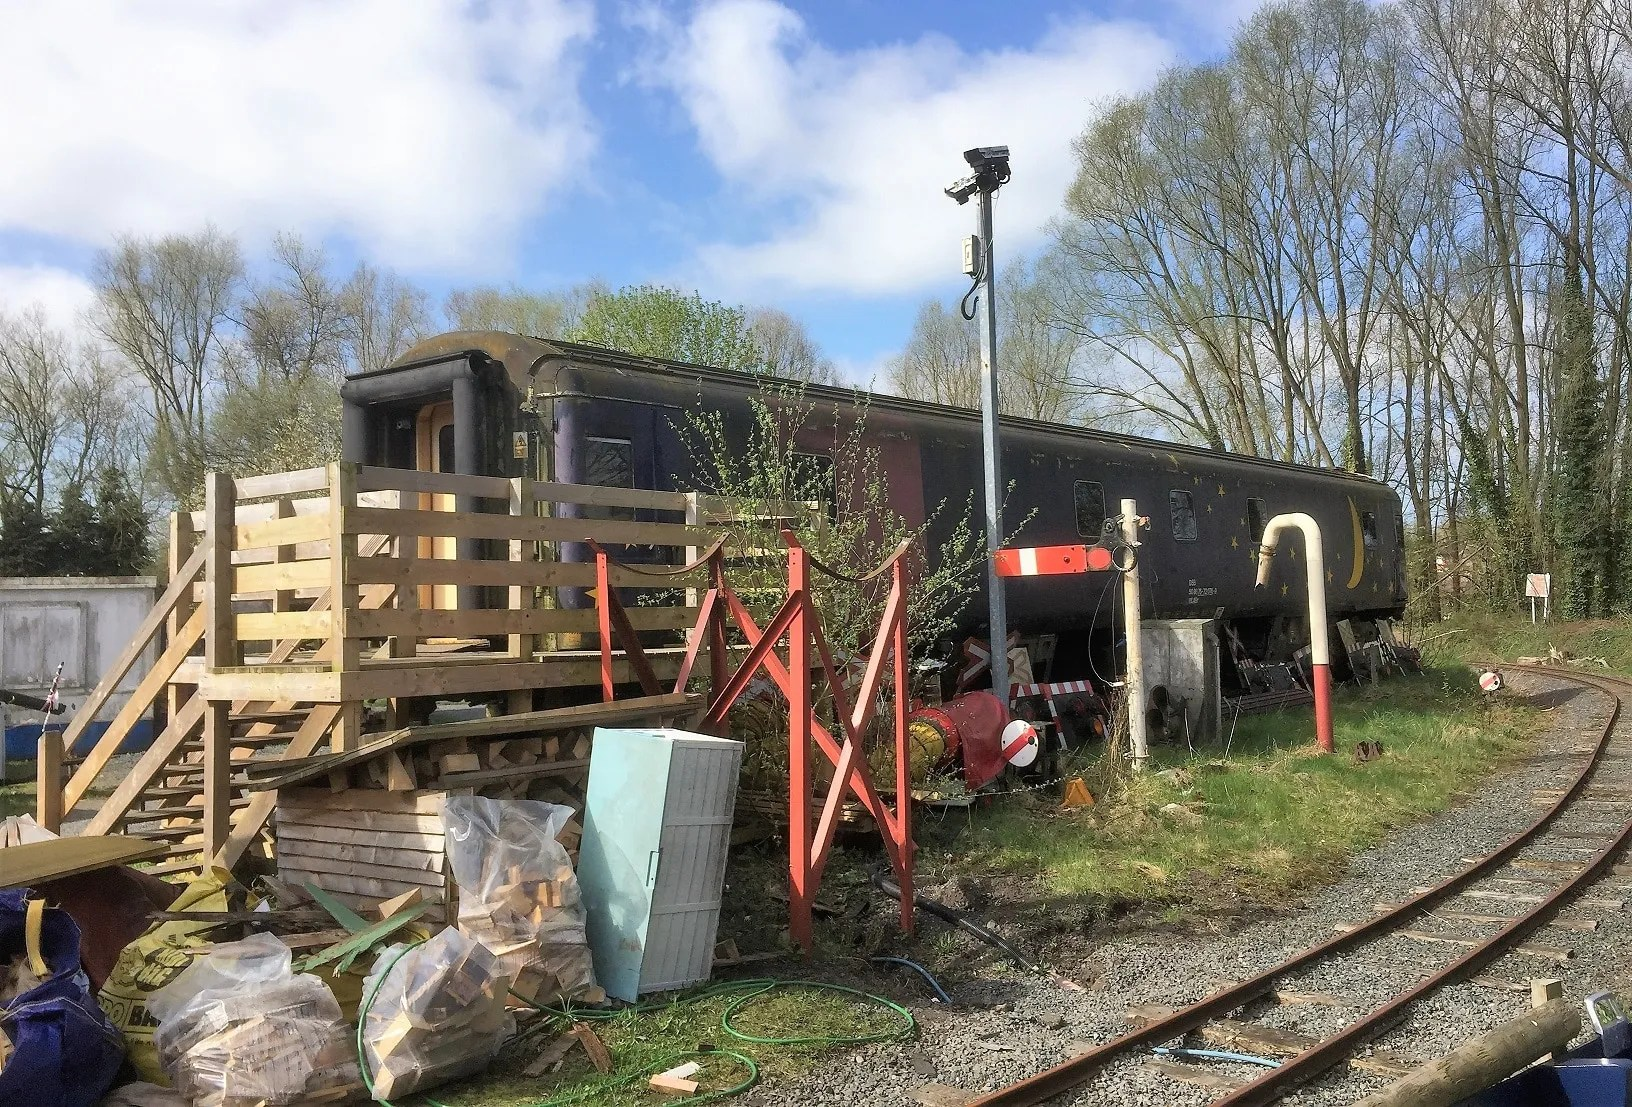 Mark 2 Sleeper at the Telford Steam Railway